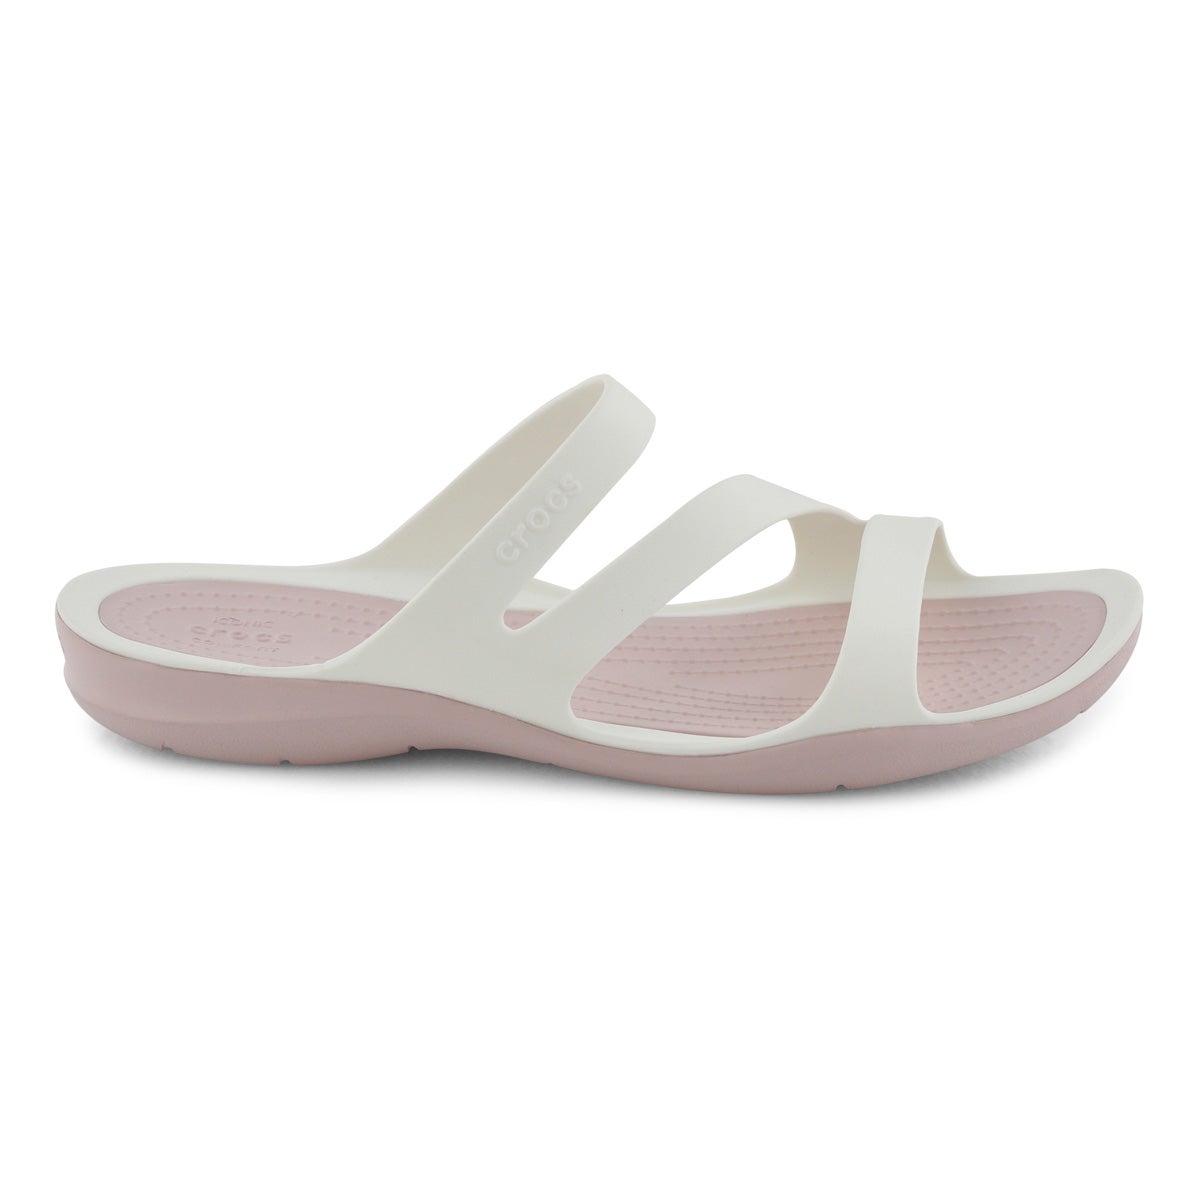 Women's SWIFTWATER white/rose slide sandals